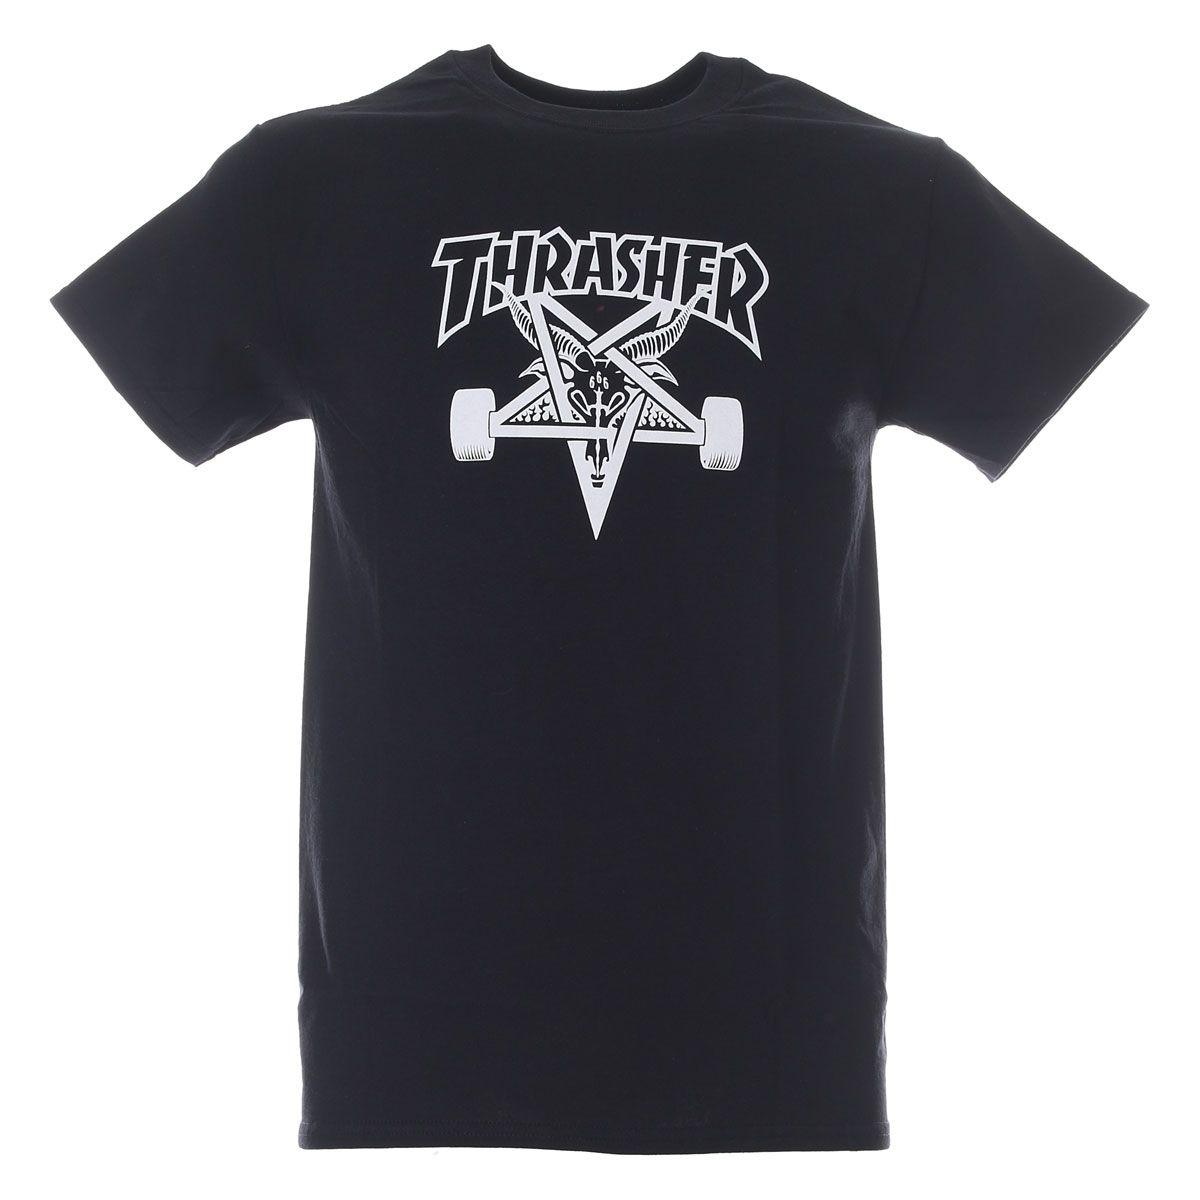 Thrasher T-Shirt Skategoat Black